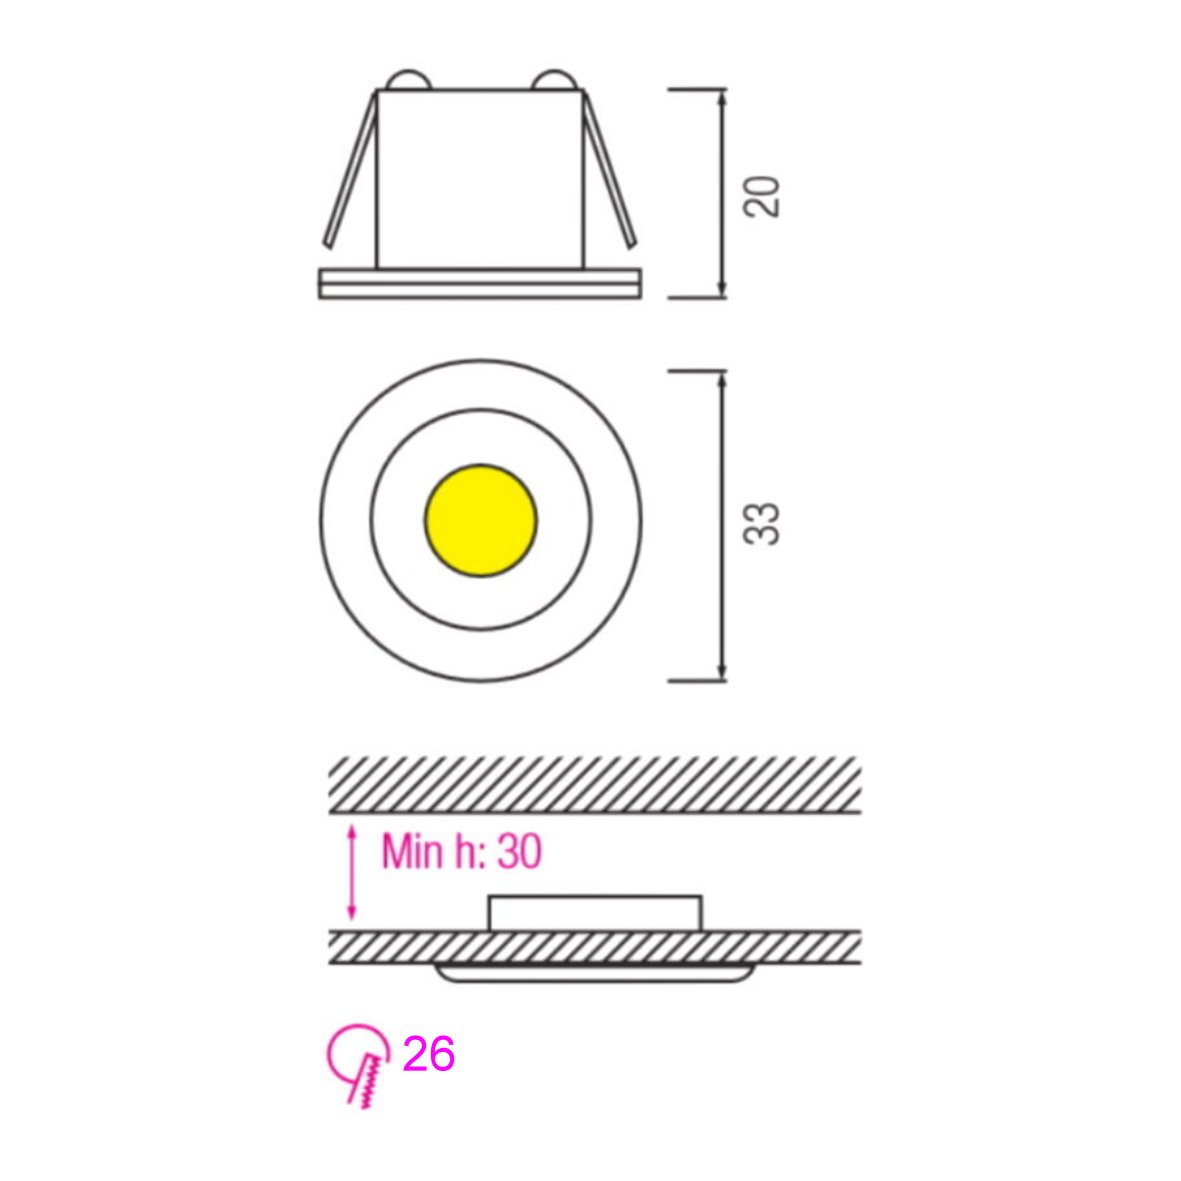 Mini Led Spot Aluminium Einbauleuchte Trafo 230v Einbaustrahler Einbau Strahler